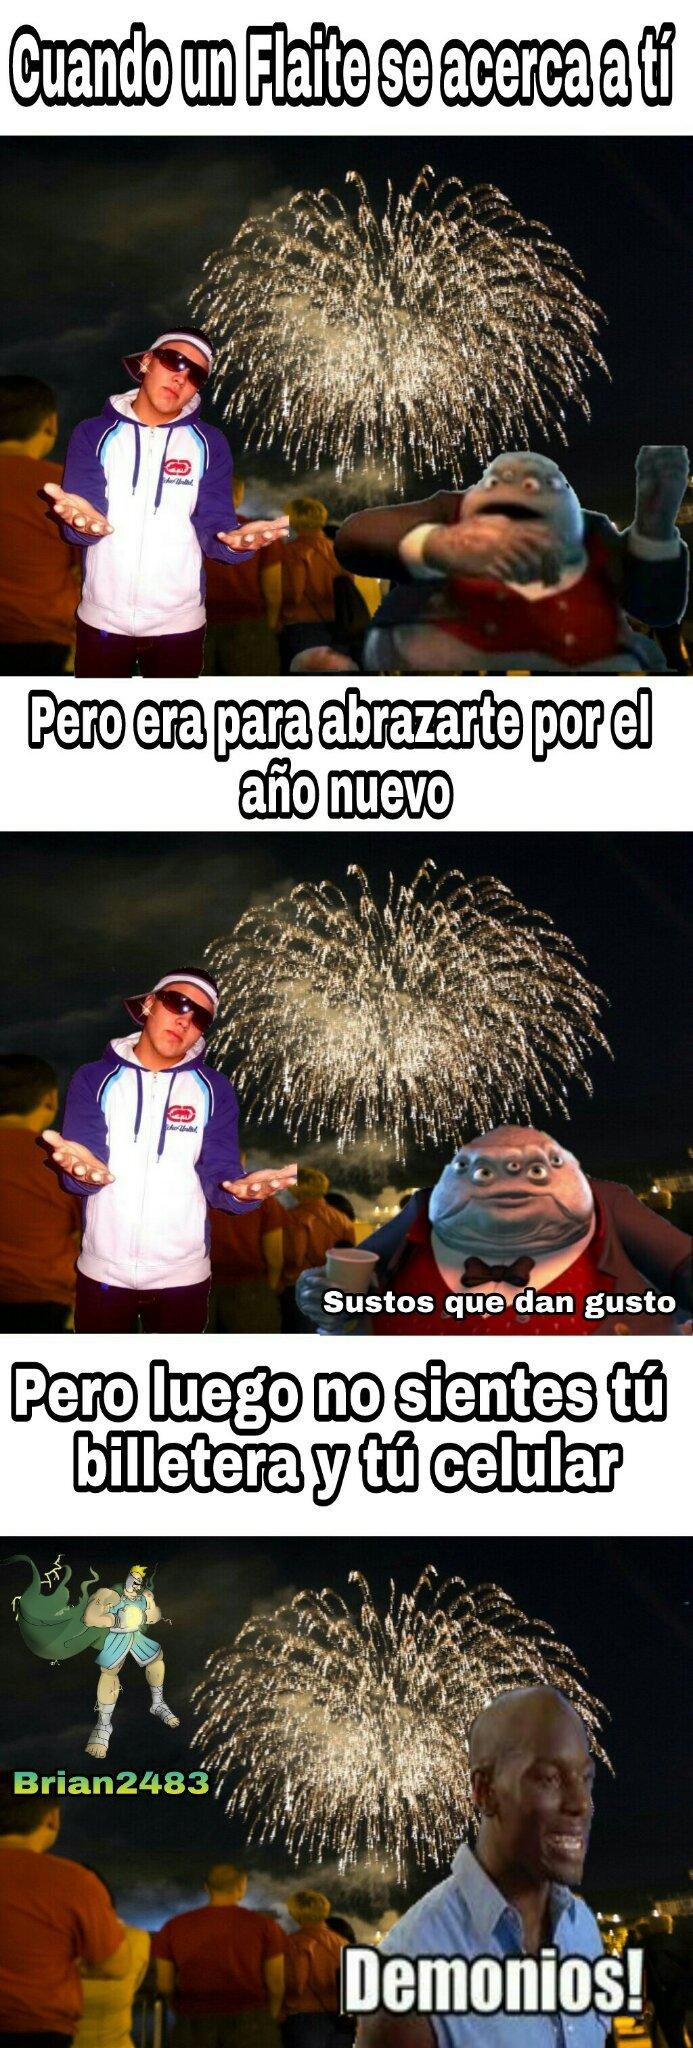 Una vez mas tarde xd(original) - meme